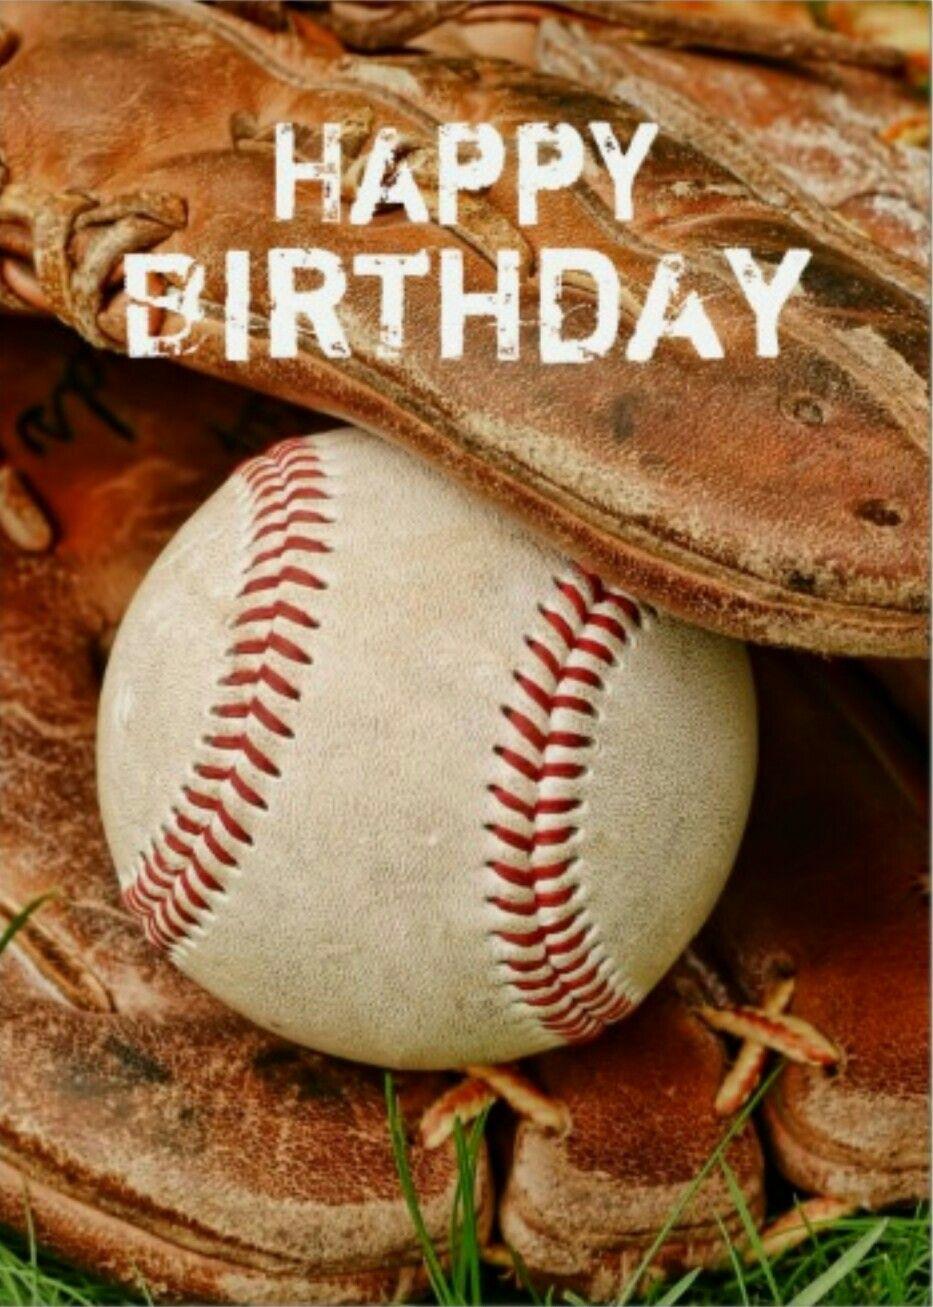 Pin By Judy Quinn On Birthday Greetings Happy Birthday Baseball